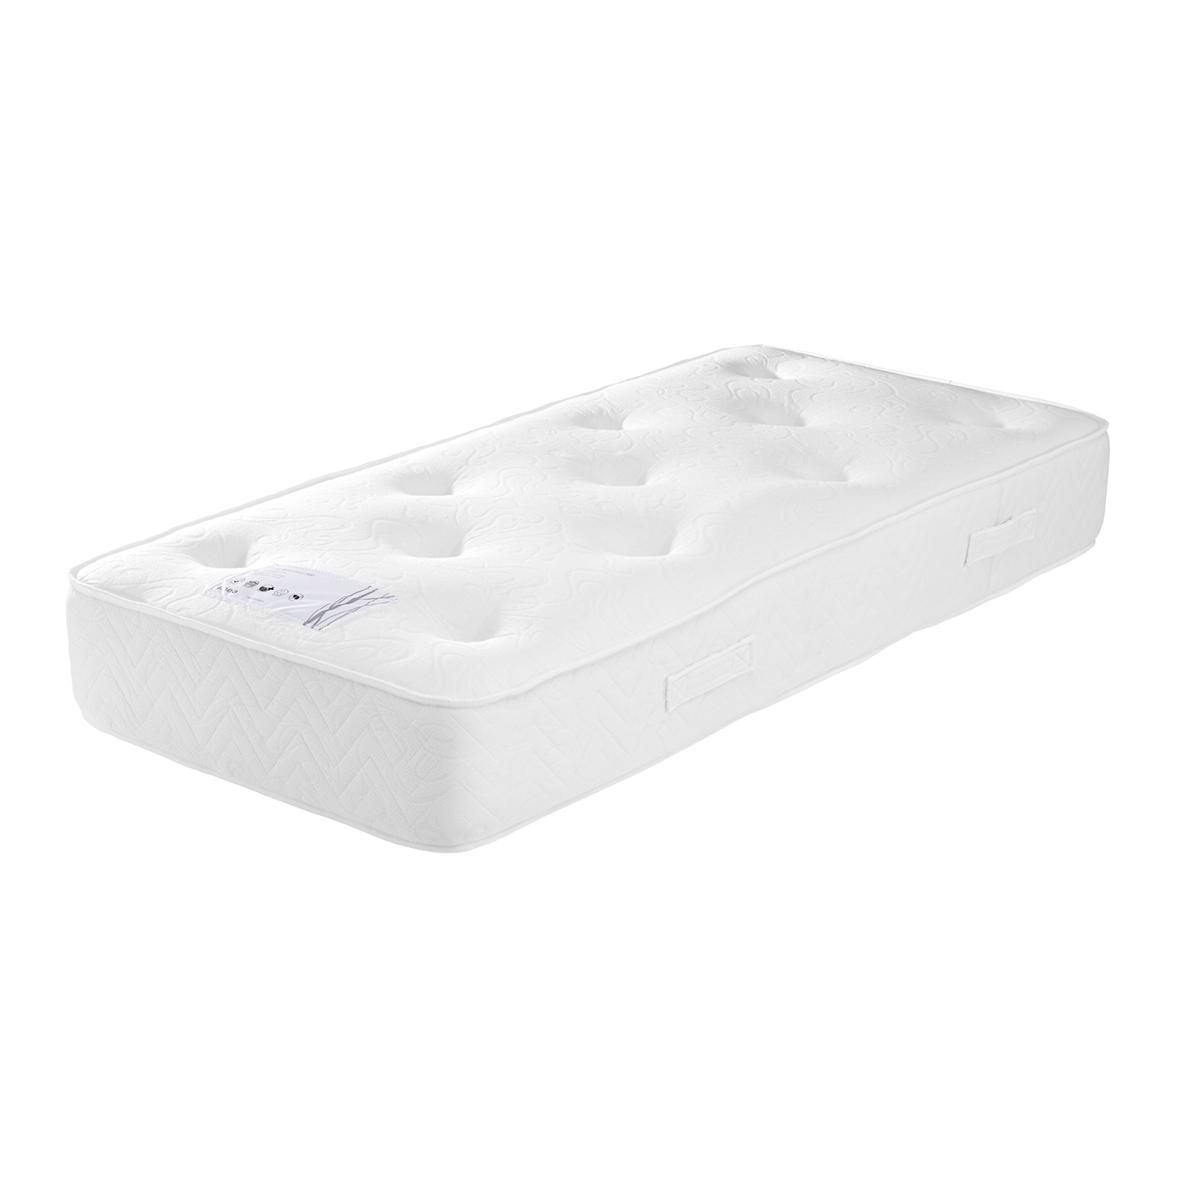 memory mats the foam mat img cariloha comfortable mattress bamboo